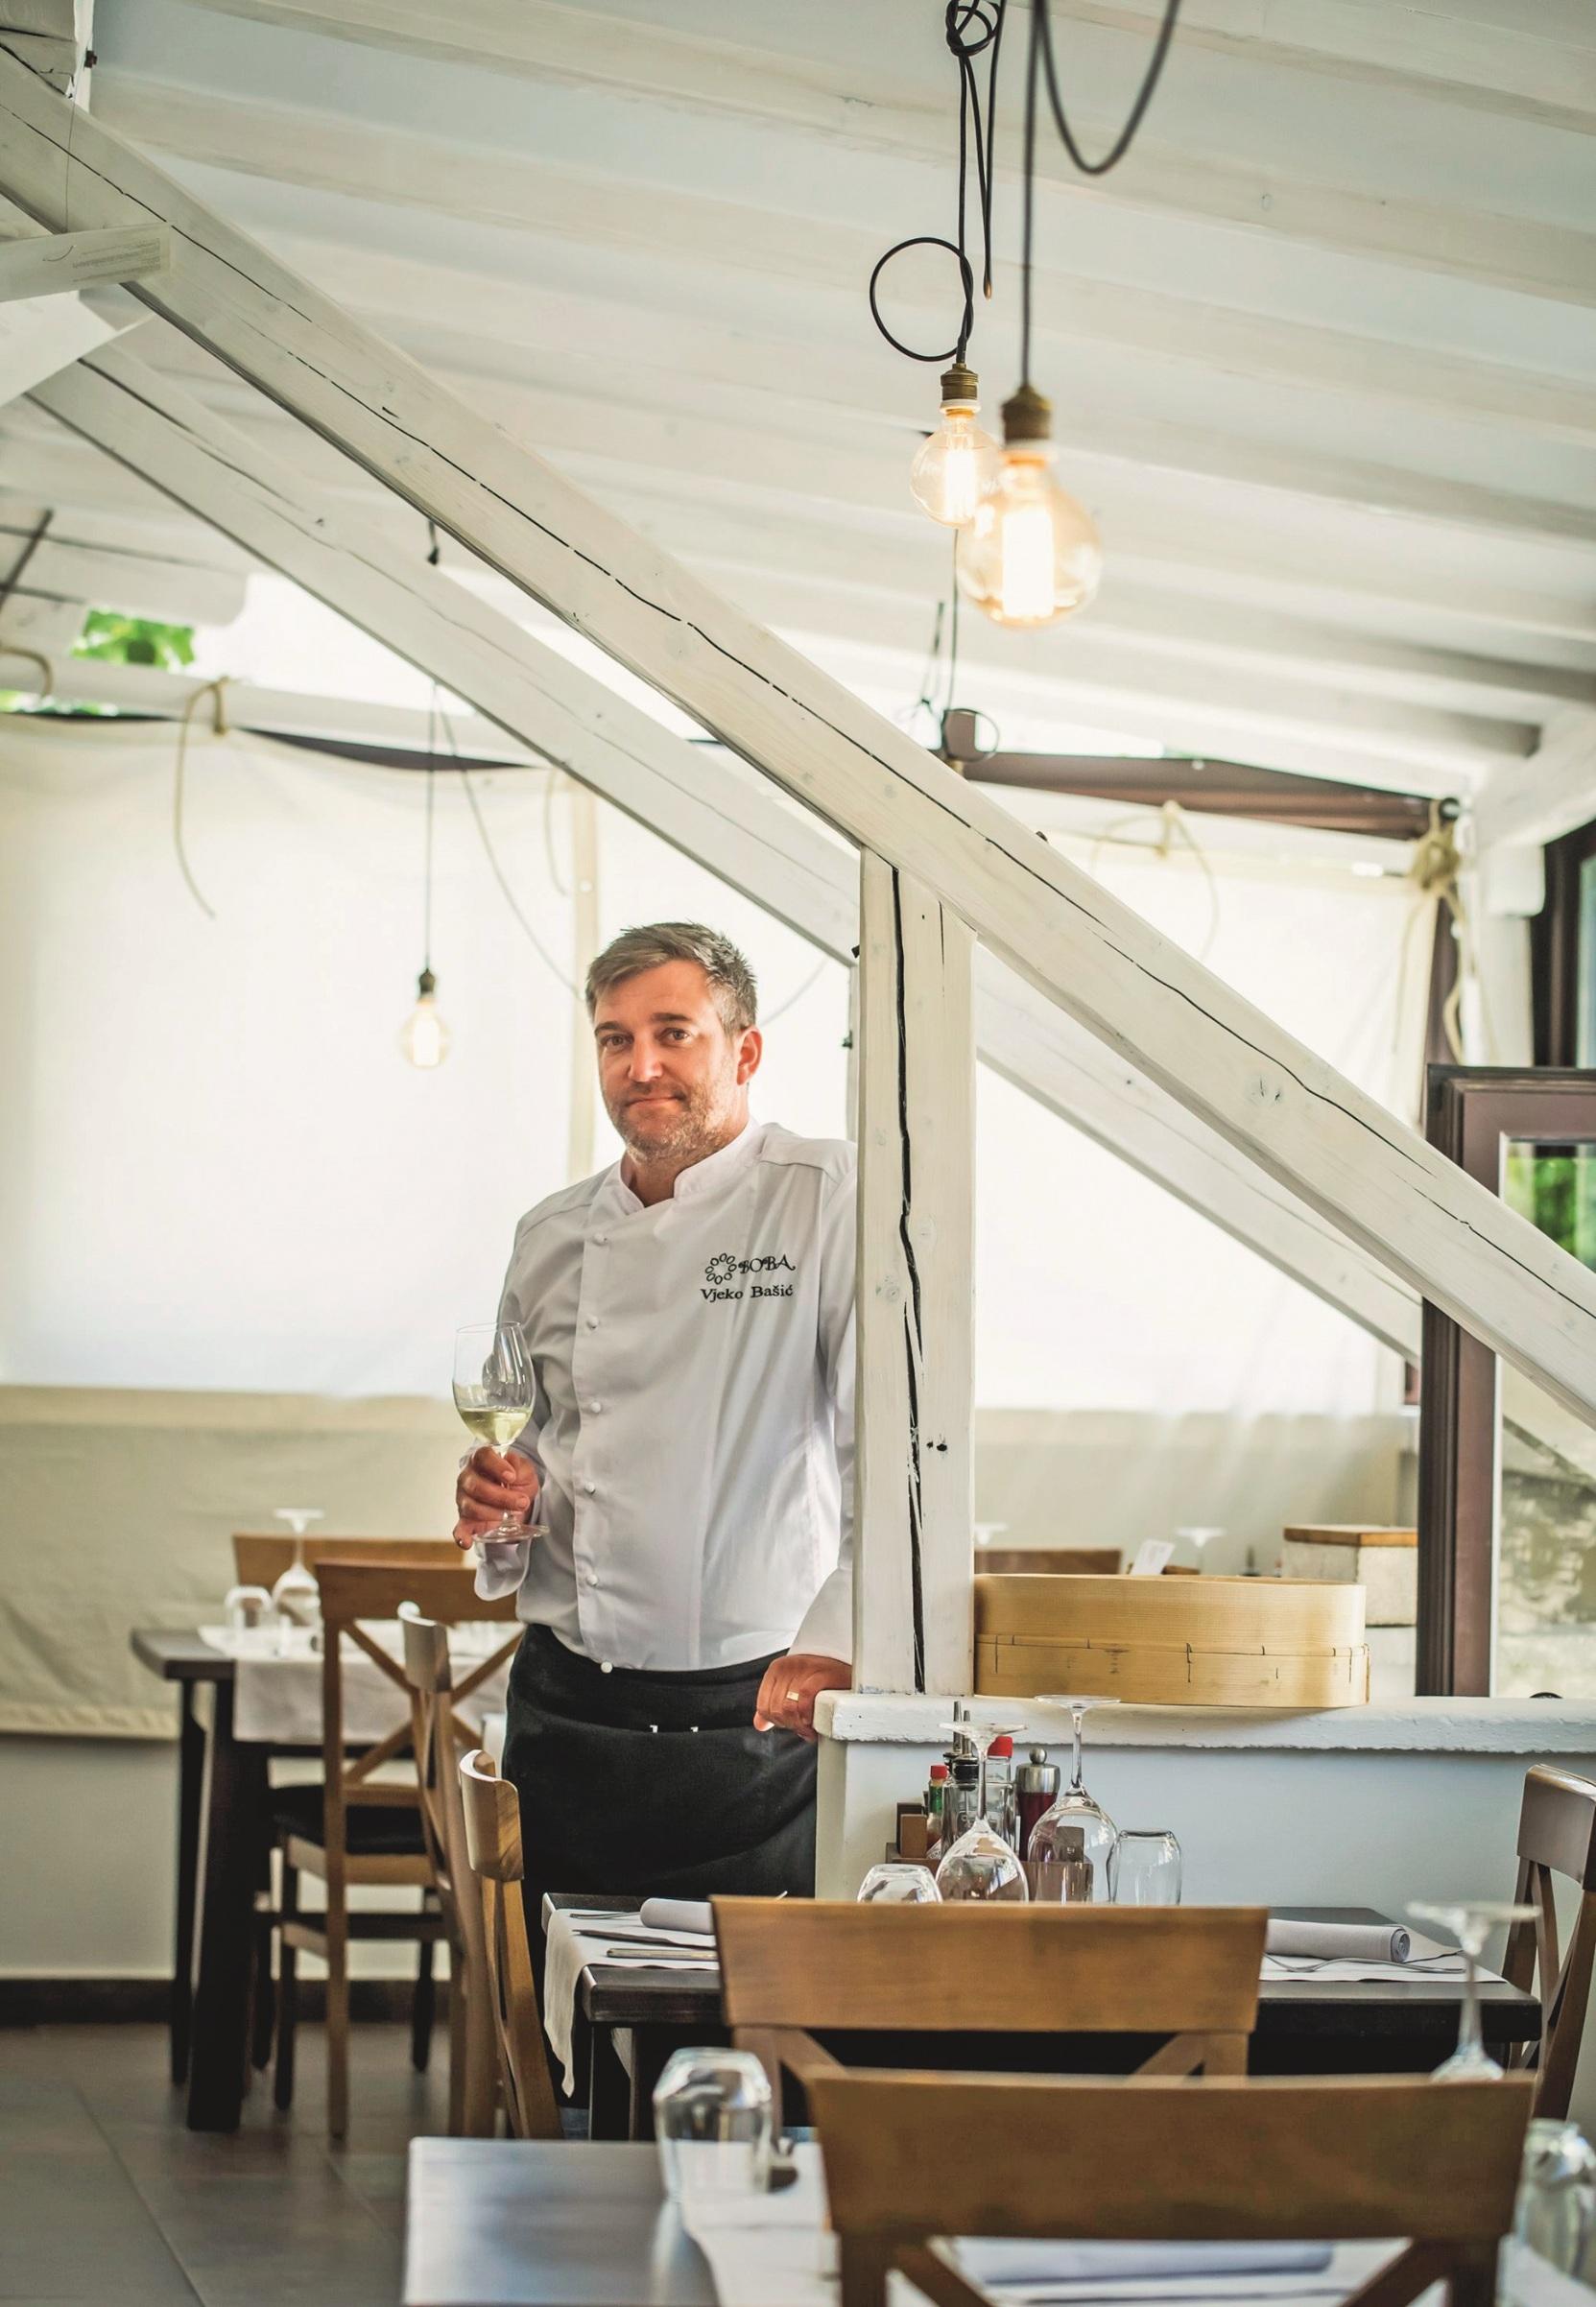 Murter, 040518. Kandidat za Michelinovu zvijezdicu kuhar Vjeko Basic. Foto: Nikolina Vukovic Stipanicev / CROPIX